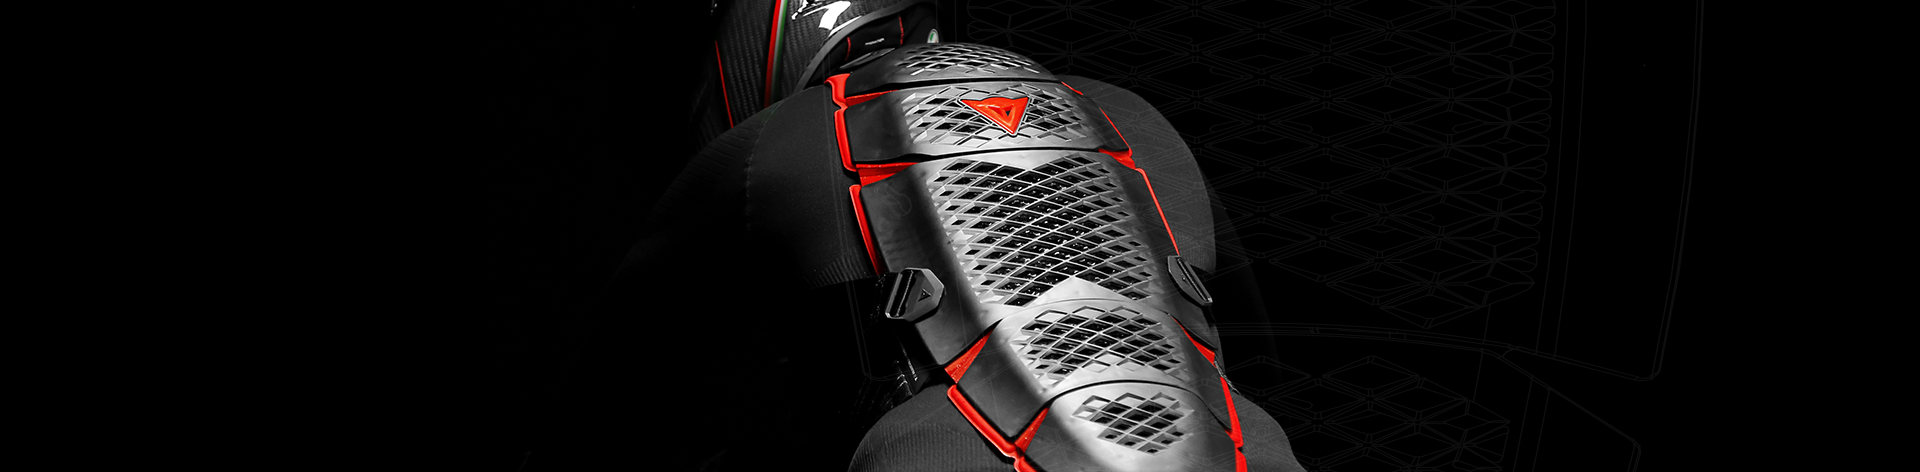 Dainese Motorbike Back Protectors